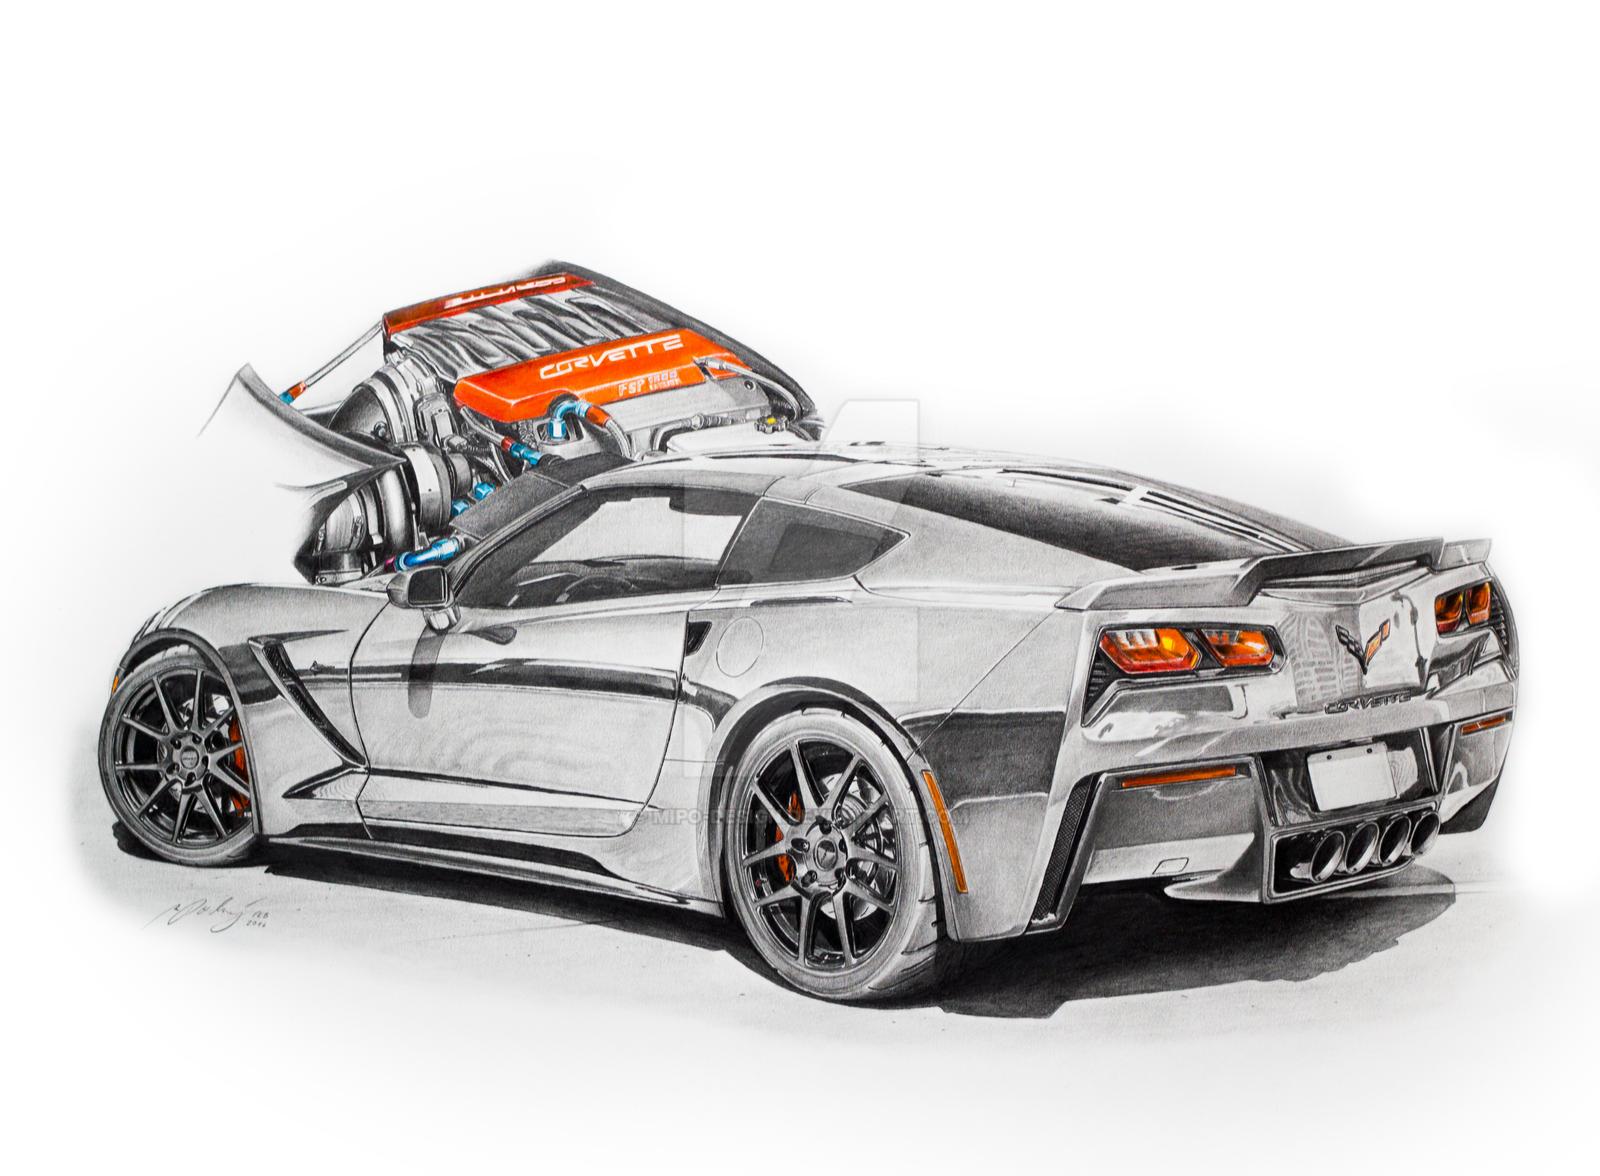 Graphite Car Drawings   SVTPerformance.com